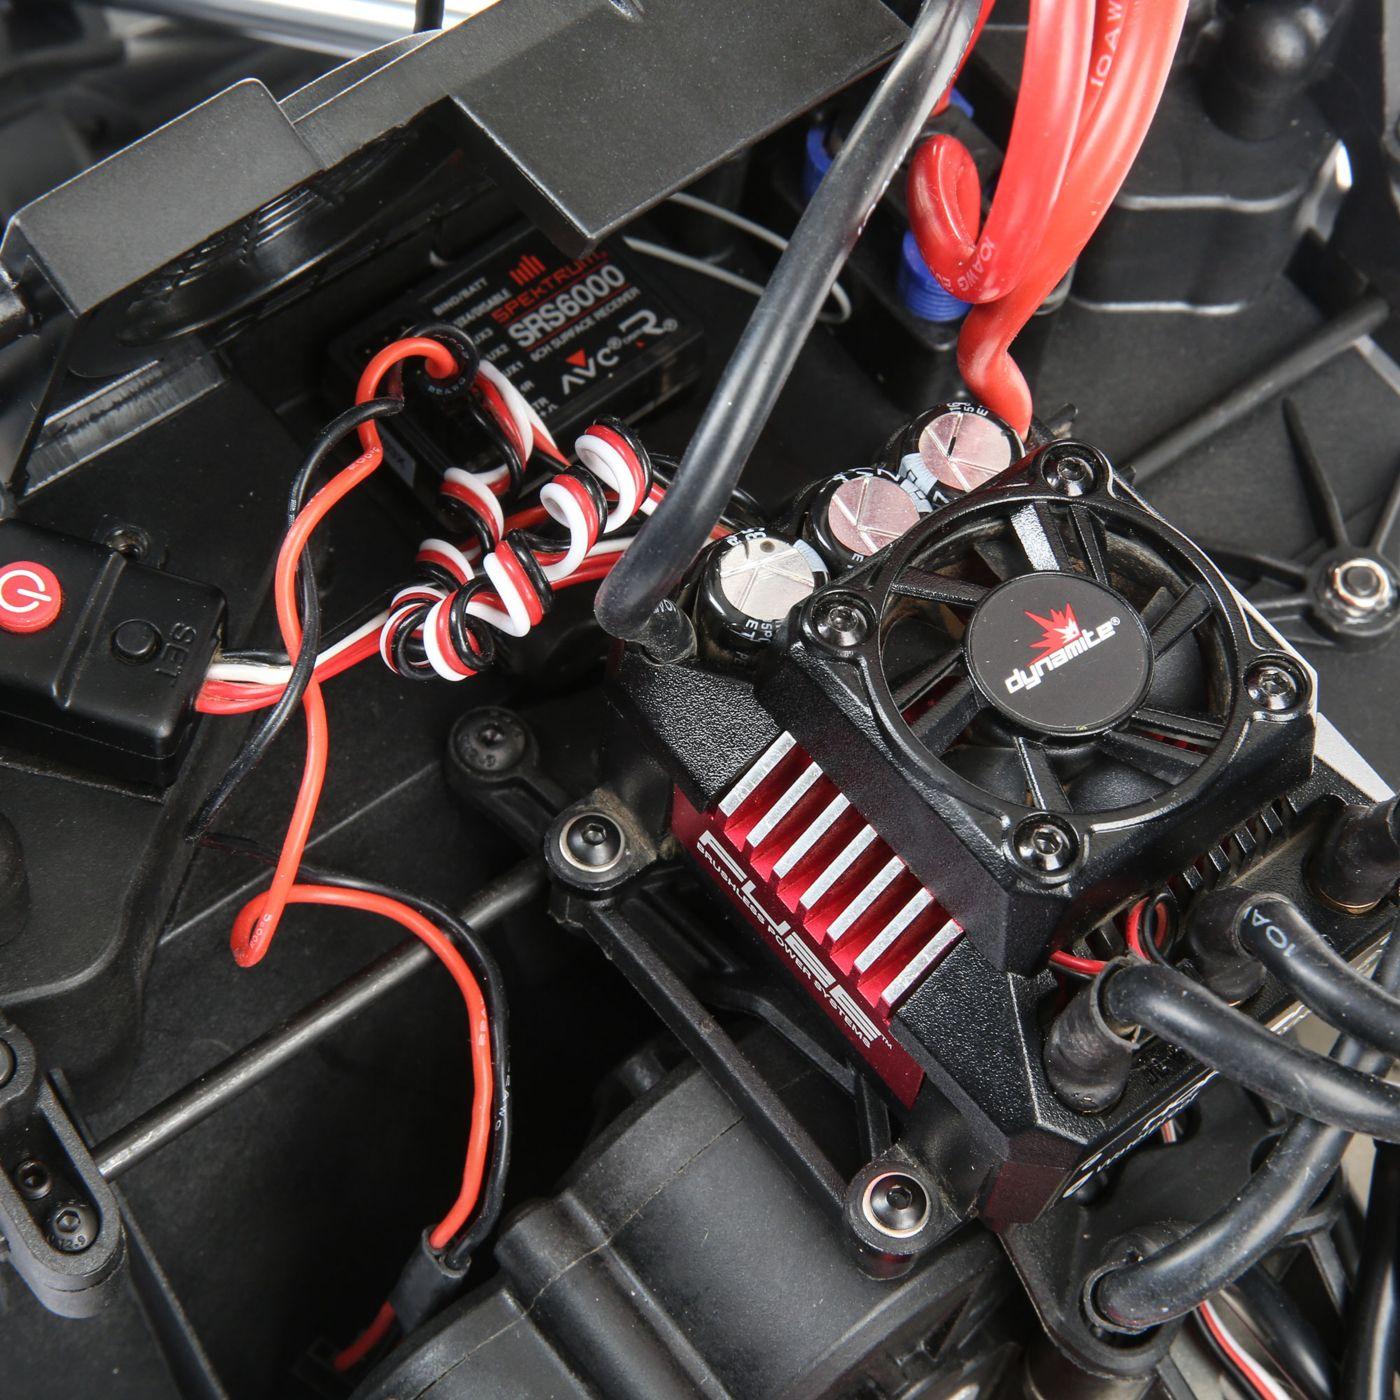 Losi Super Baja Rey Brushless 1/6 4WD RTR 4